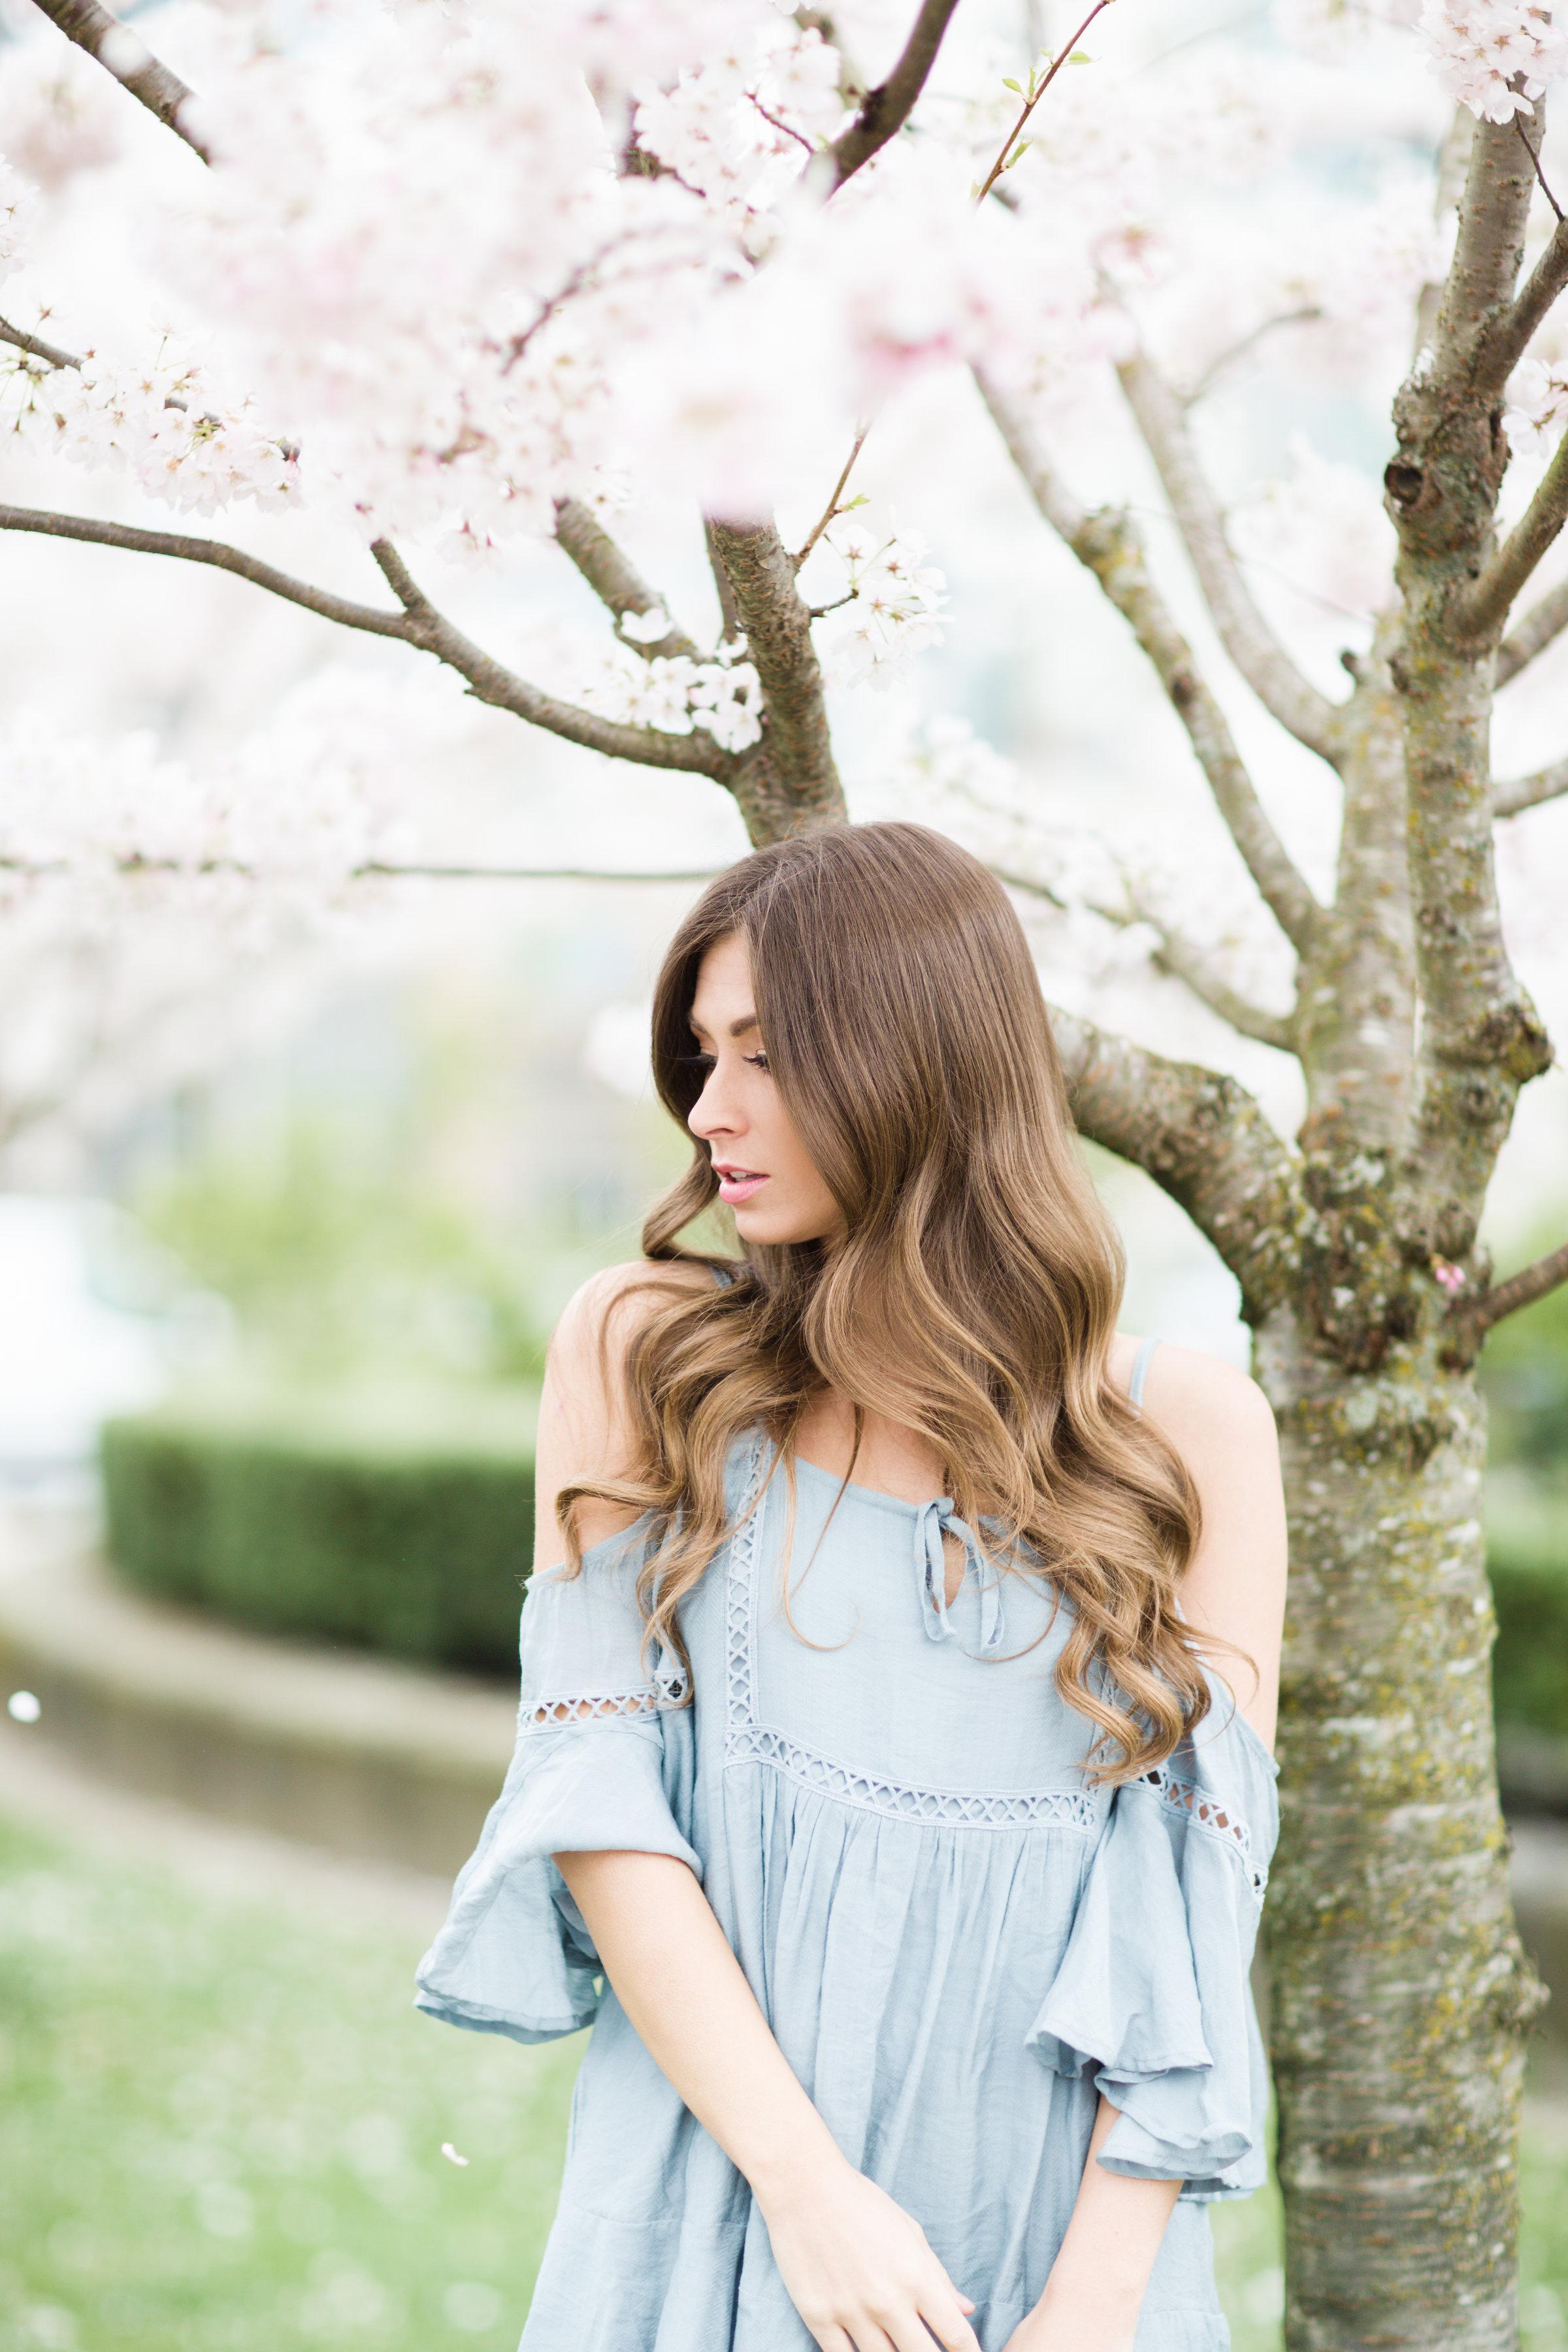 Best Wedding Salon Vancouver | Prép Beauty Parloura